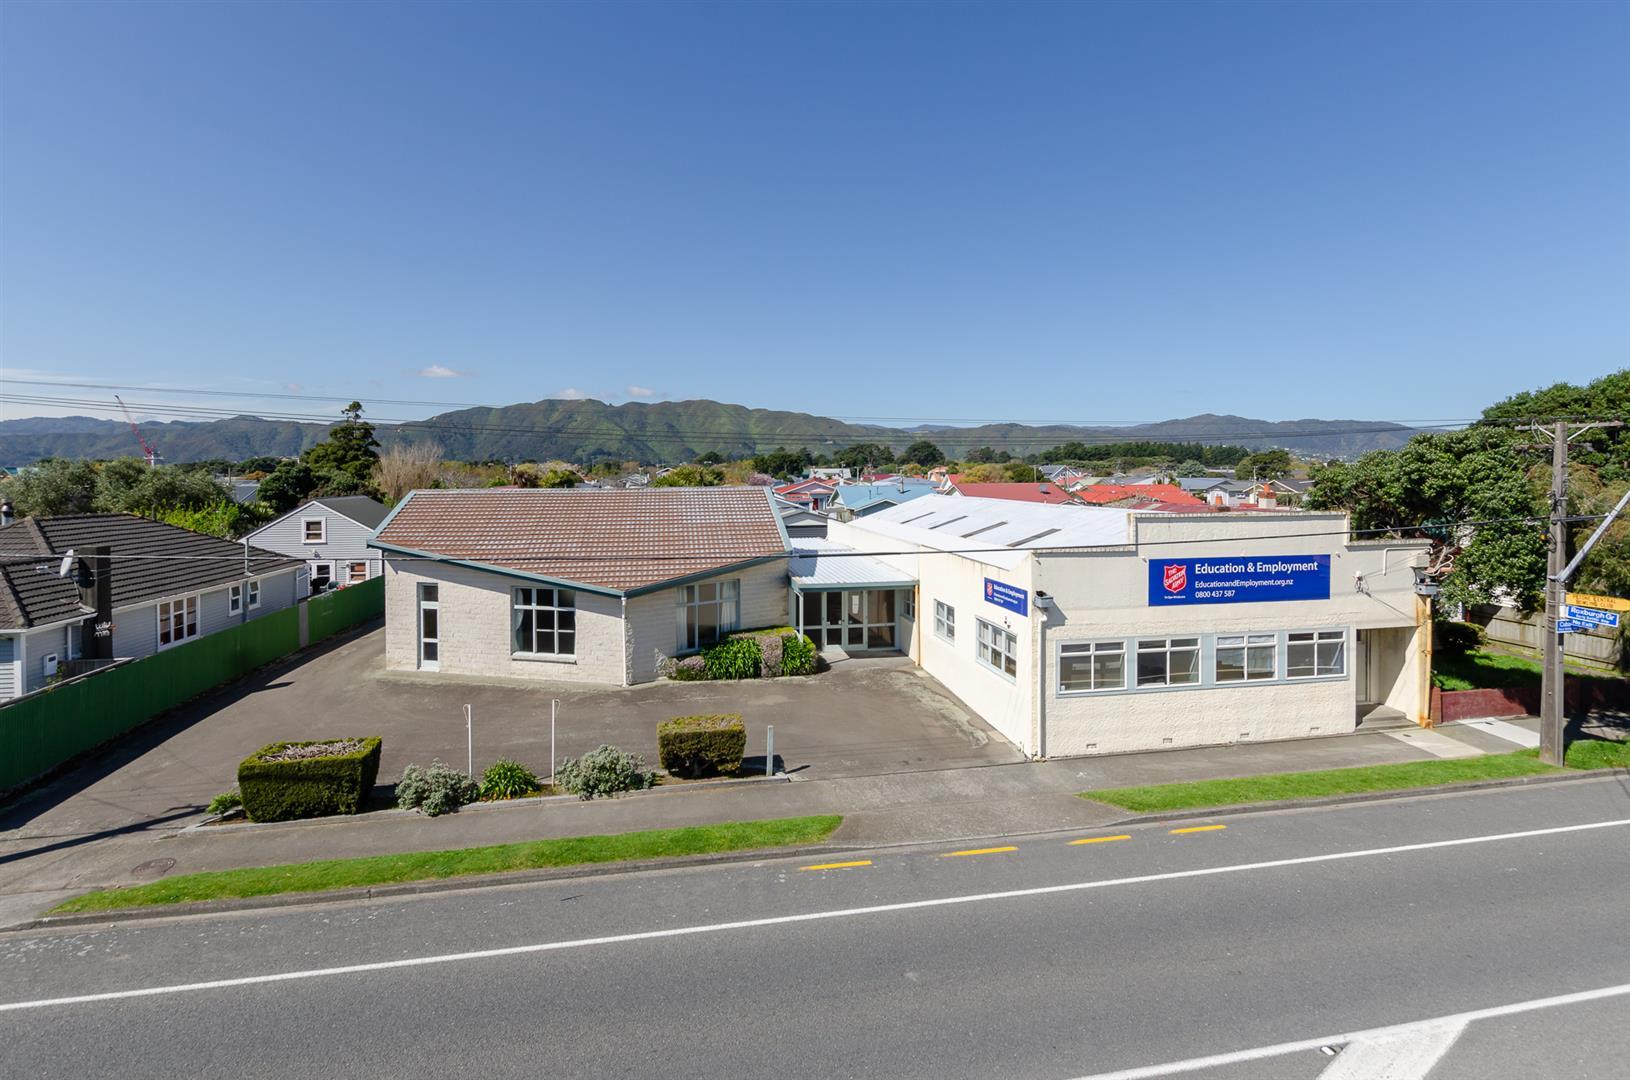 120-124 Cuba Street, Petone, Hutt Valley, Wellington